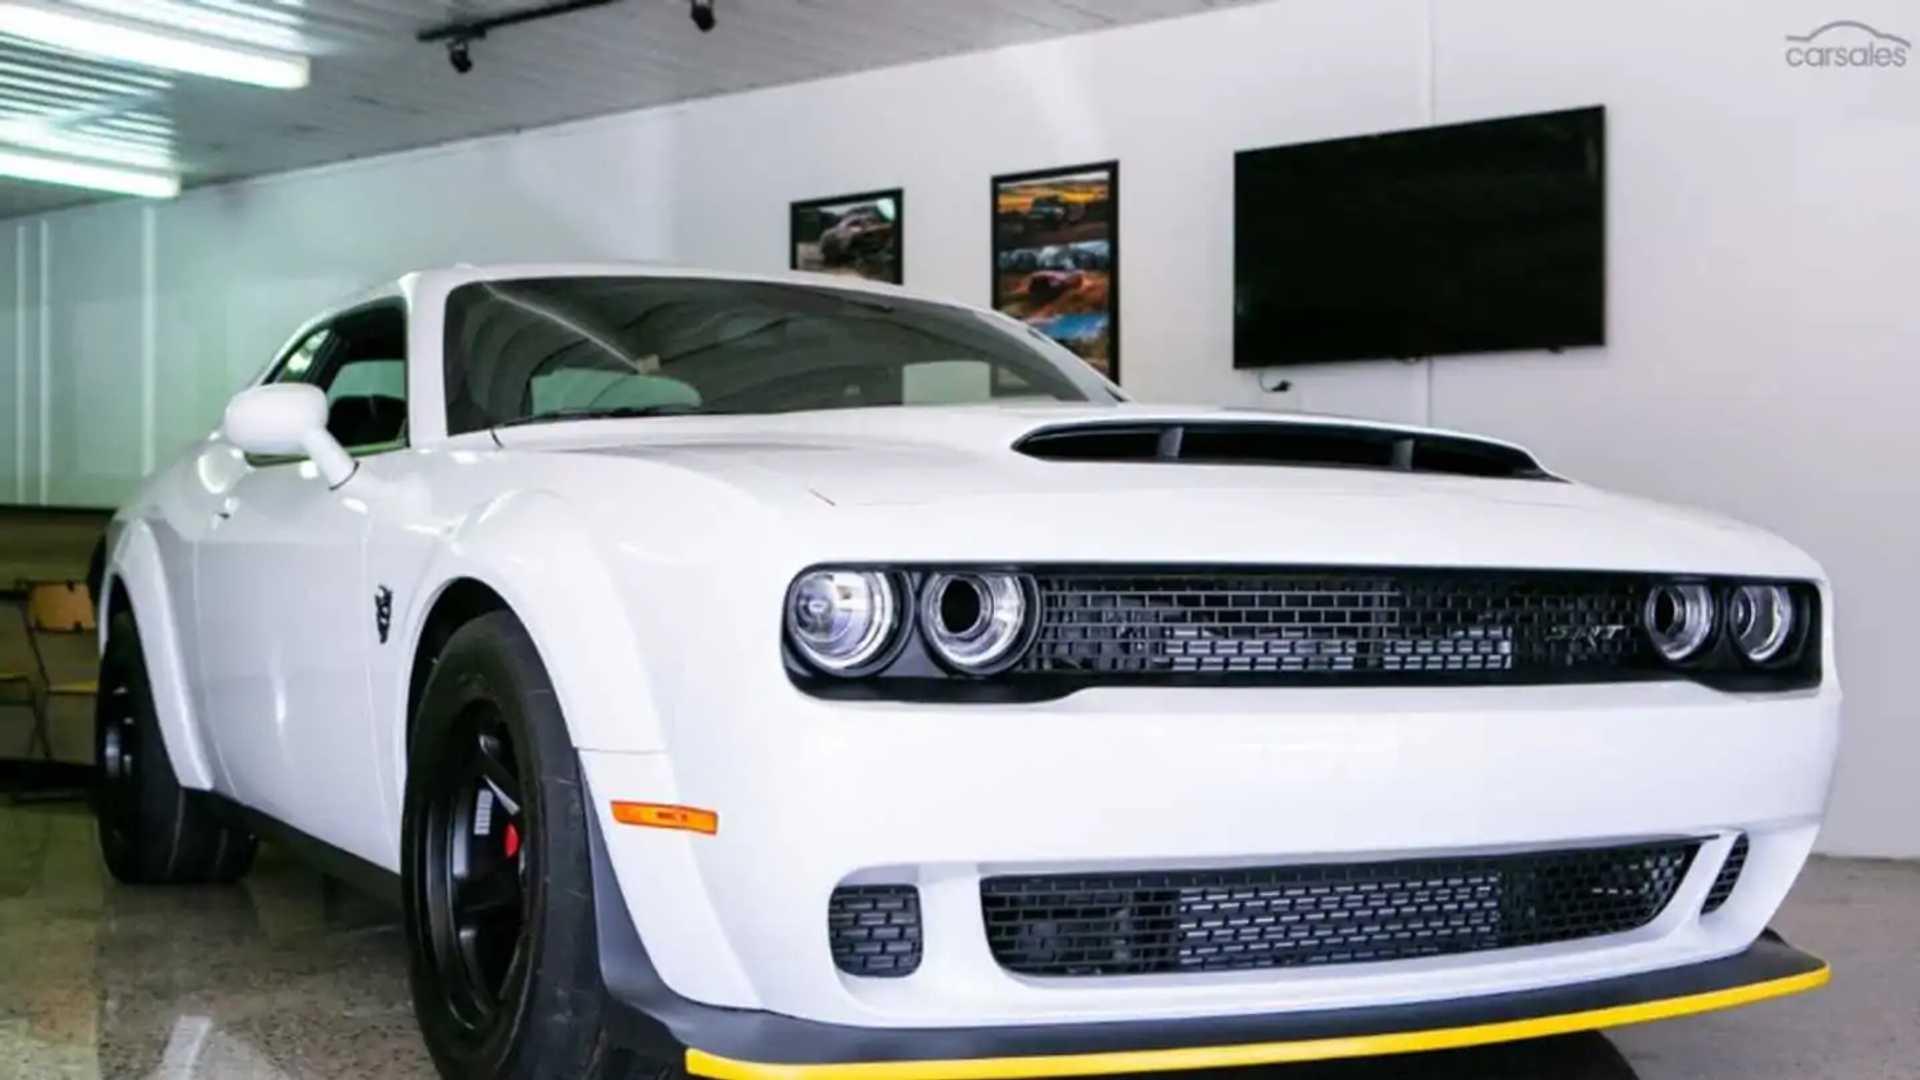 white dodge demon for sale Last production Dodge Demon for sale in Australia, or is it?